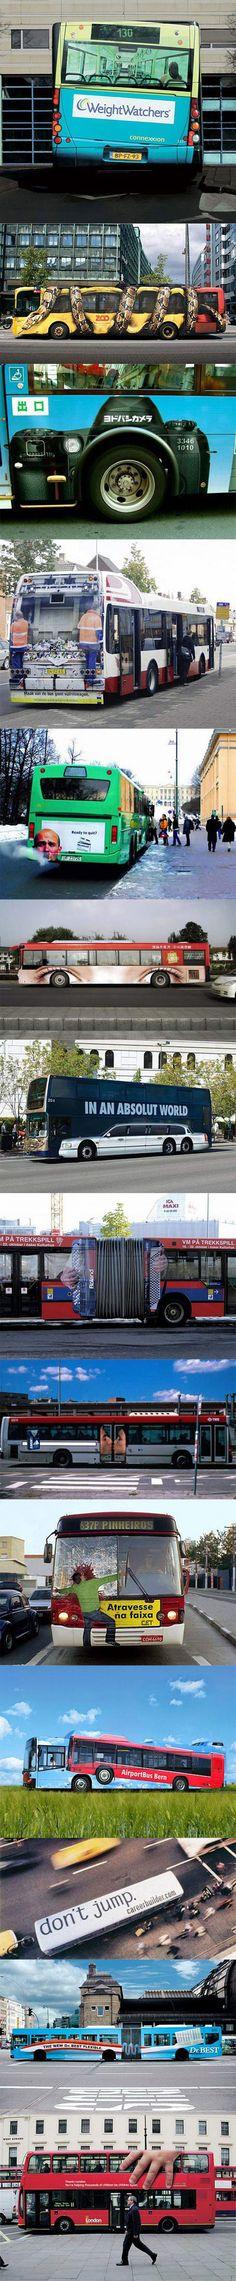 bus-ads-paintings-art